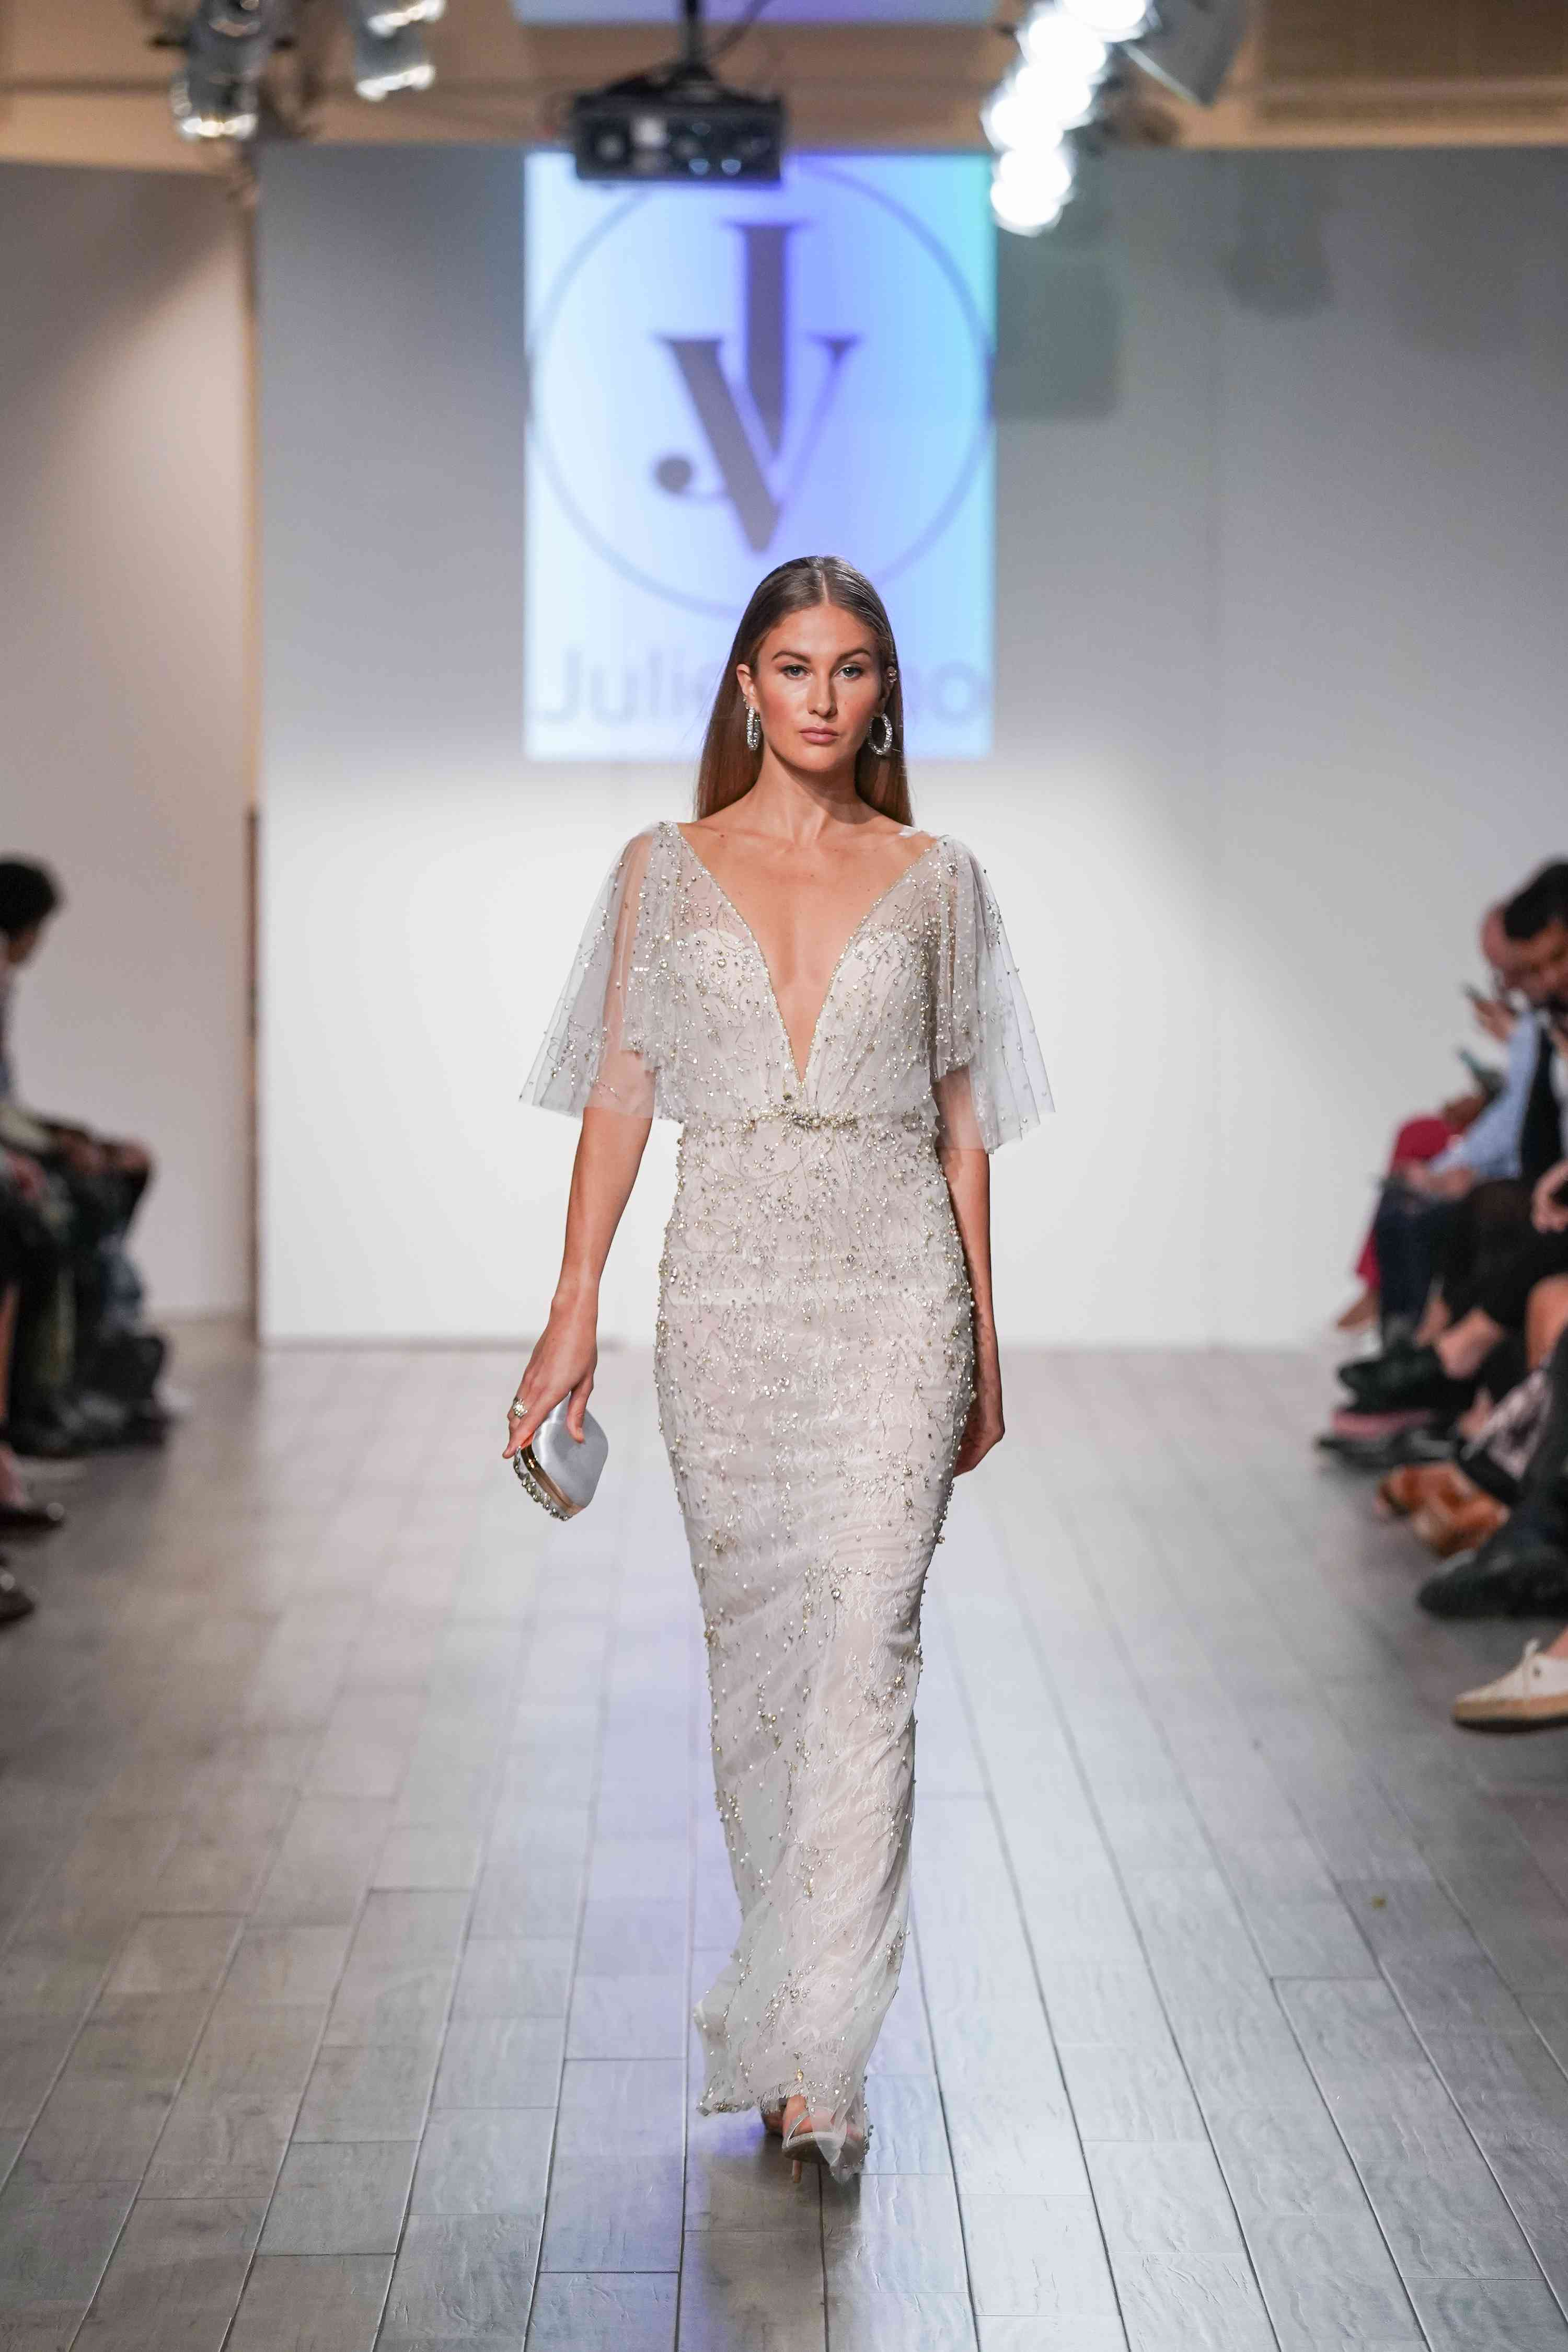 Model in fitted flutter sleeve wedding dress